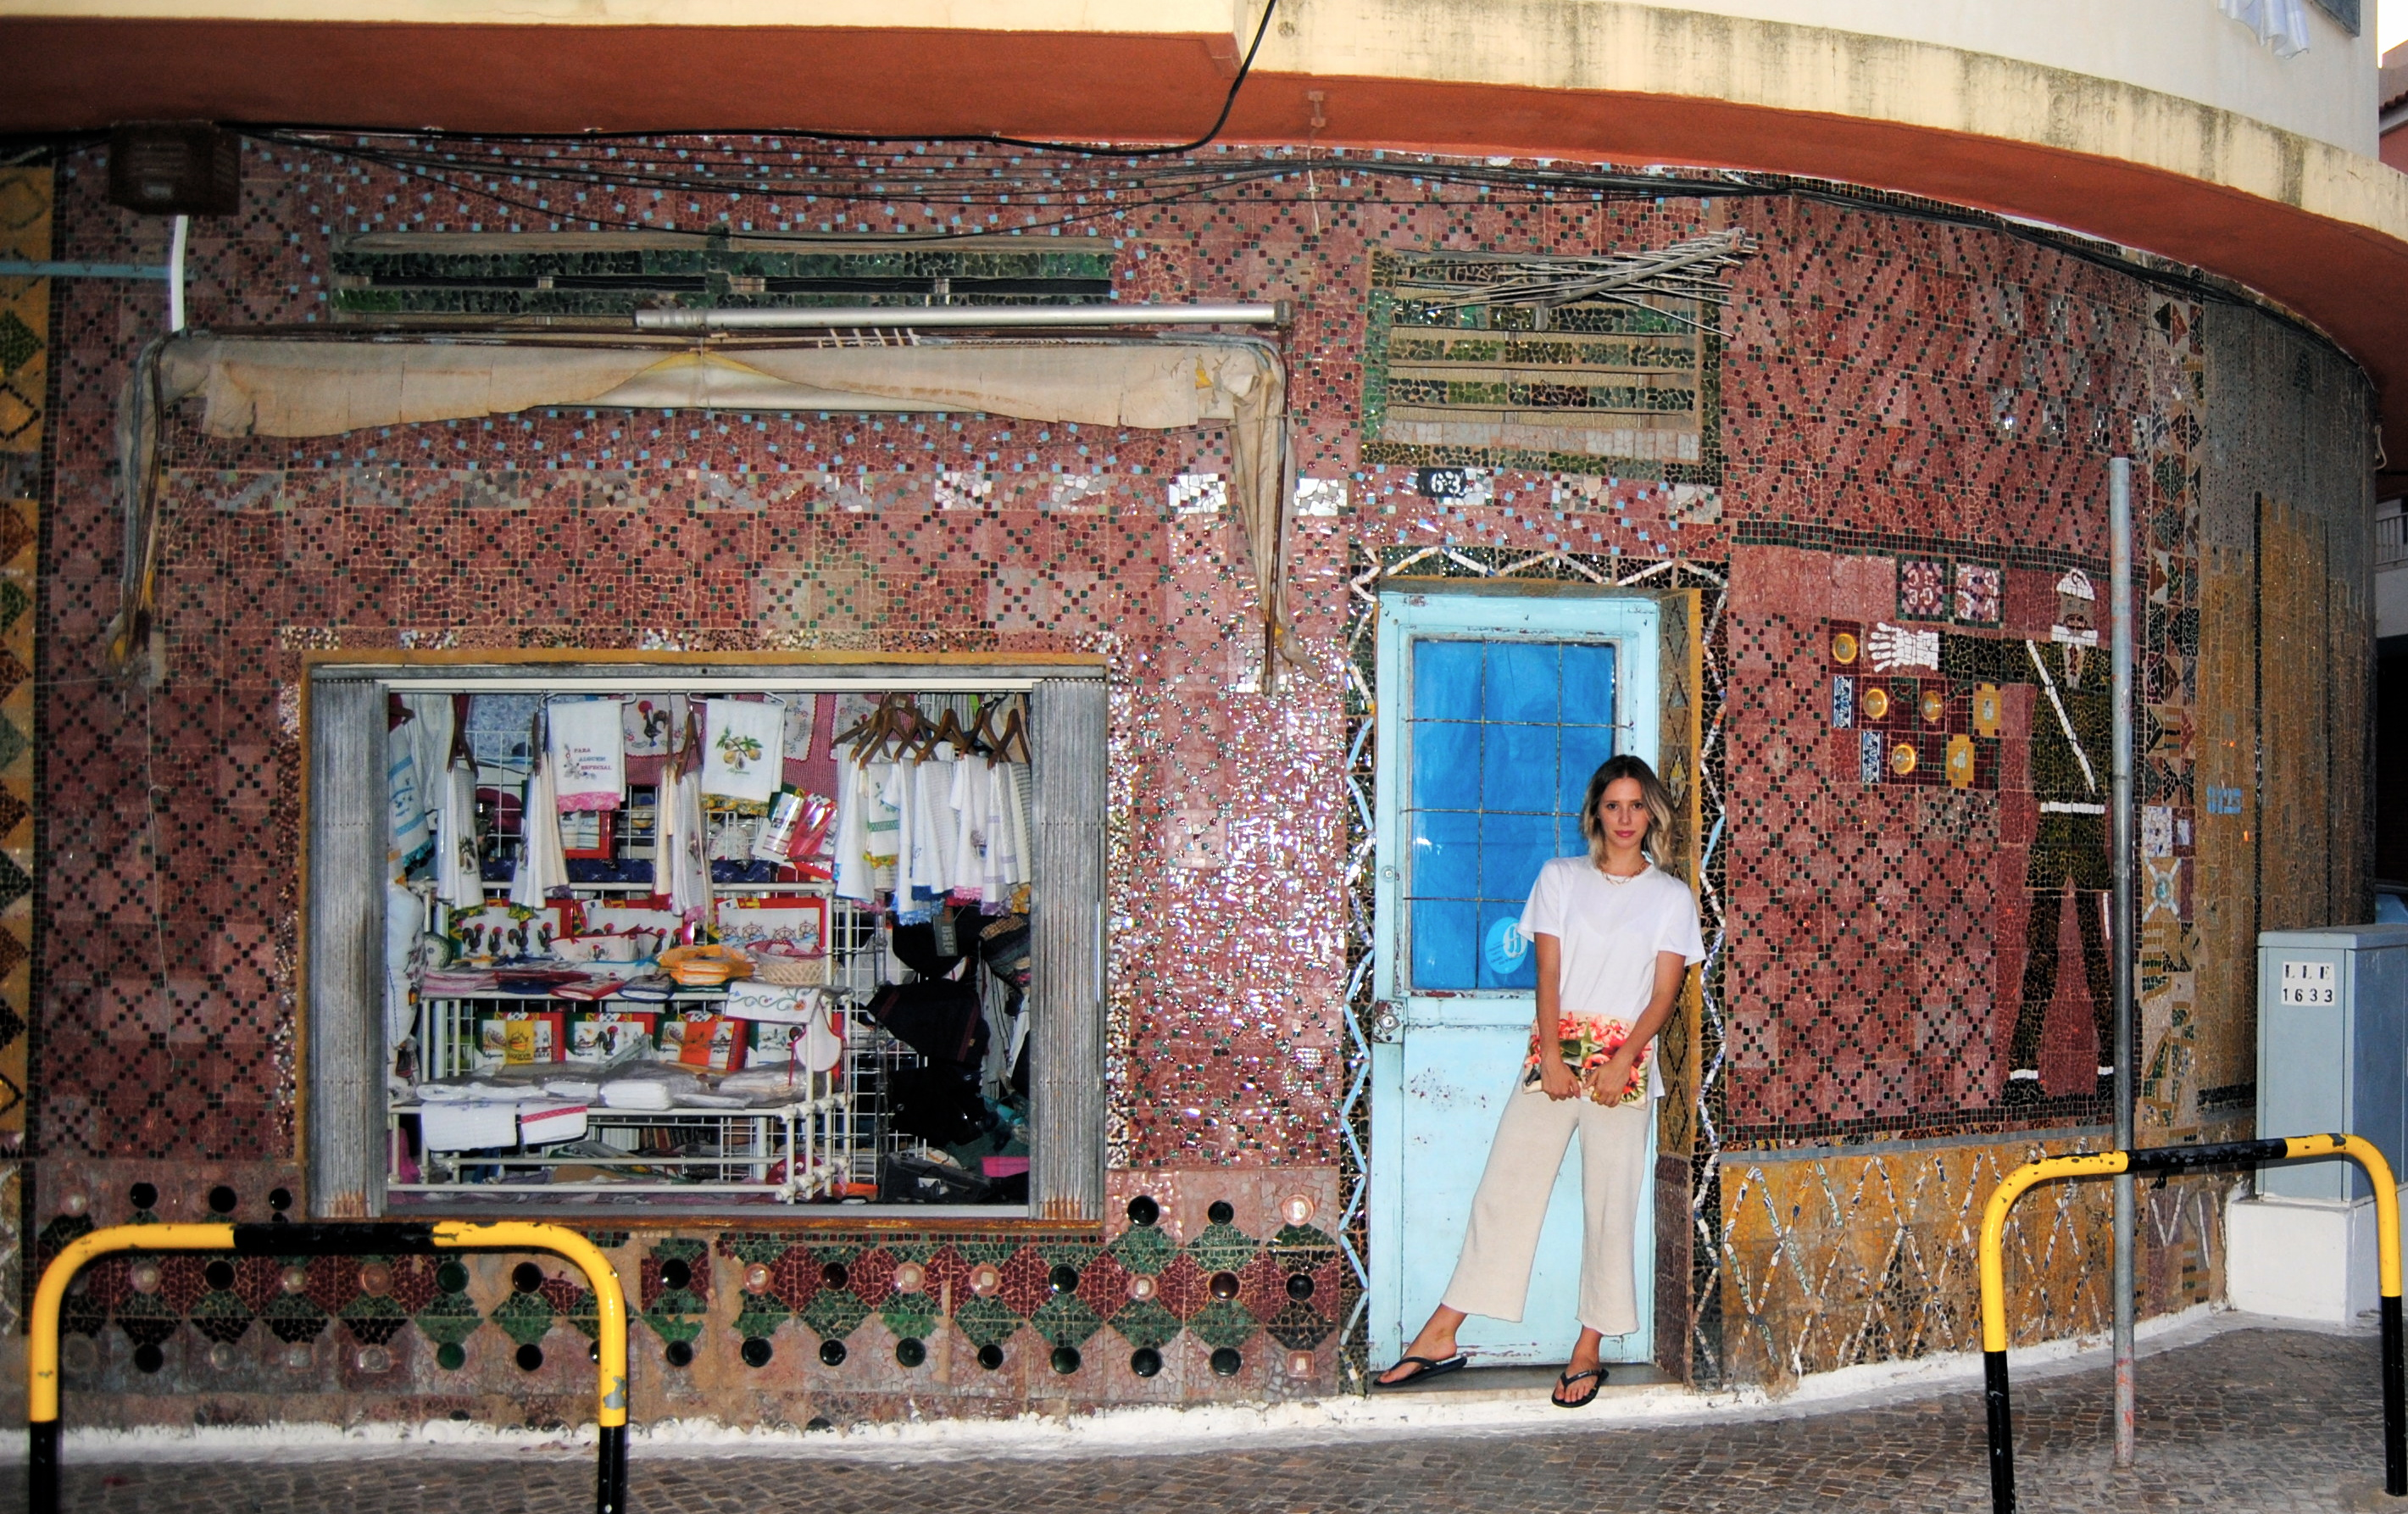 The Joker Pub & Restaurant-3232-lulufigueroa